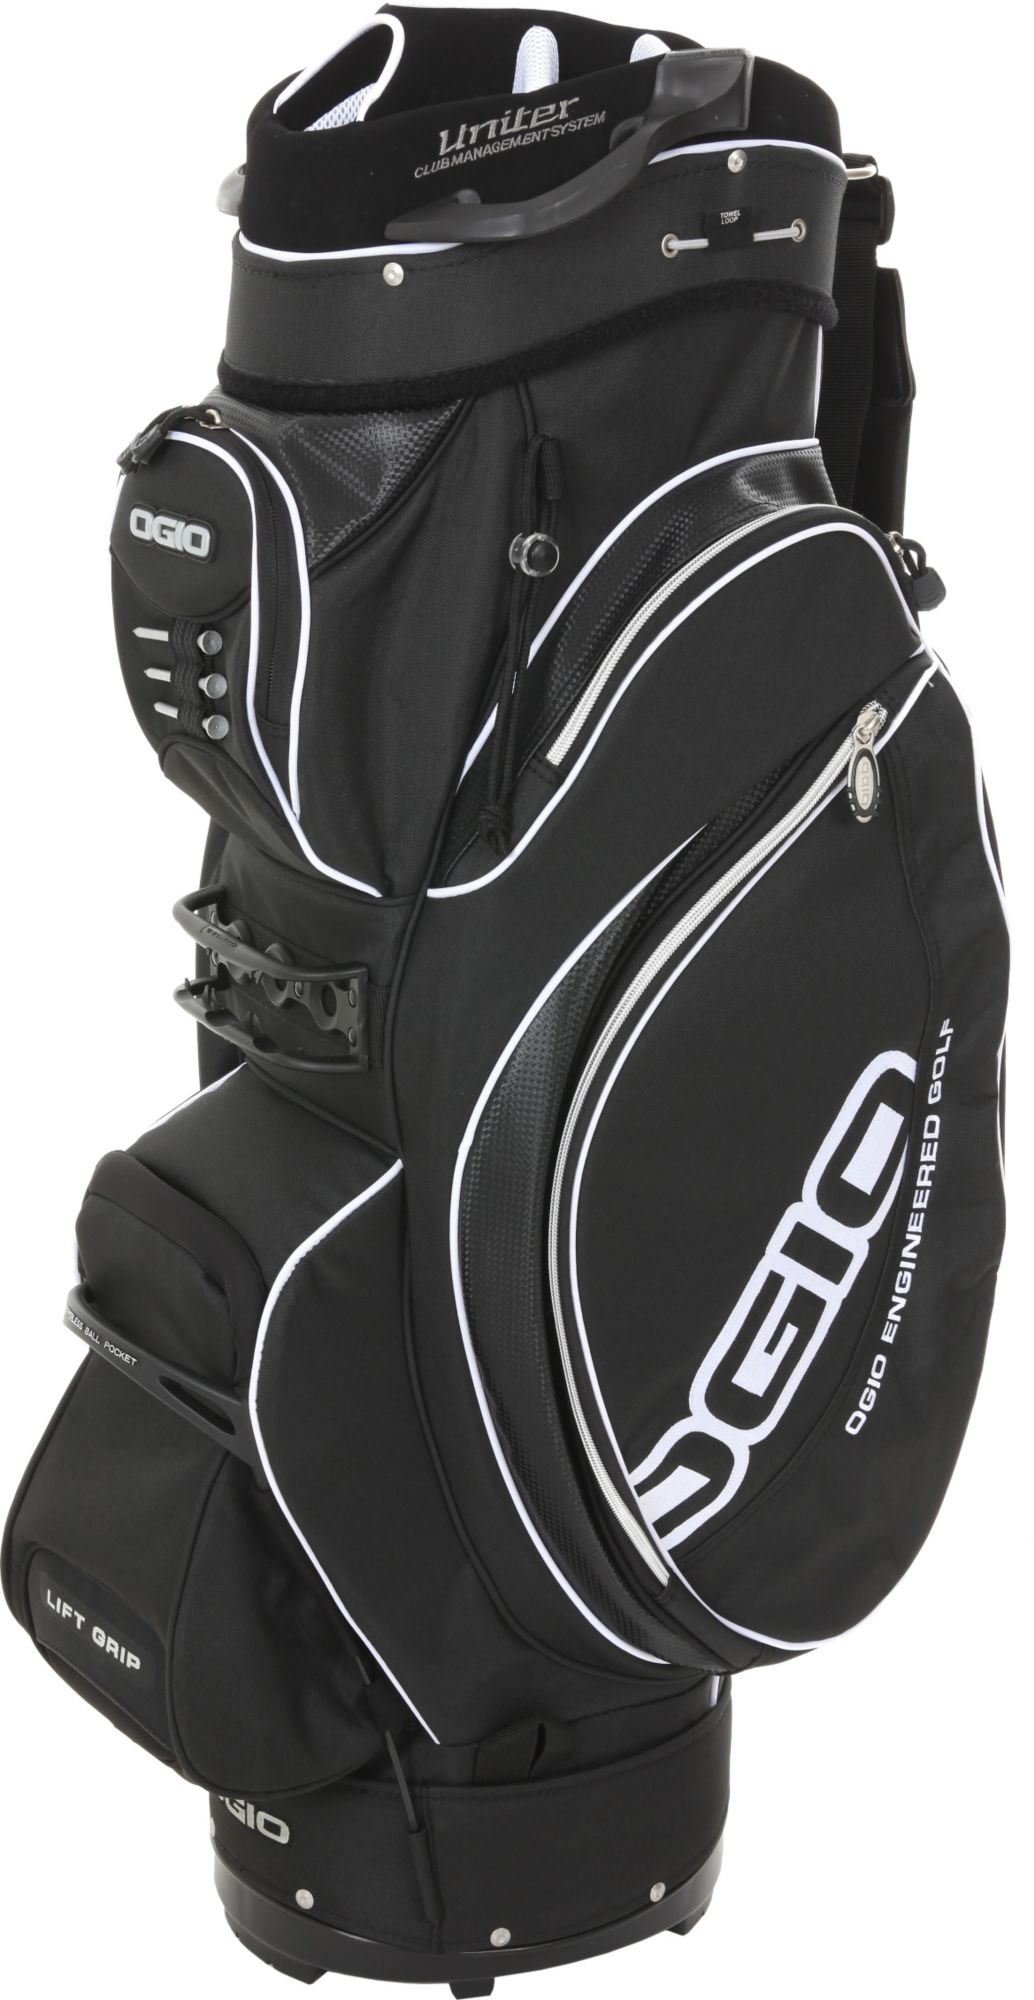 Ogio Spyke Cart Bag